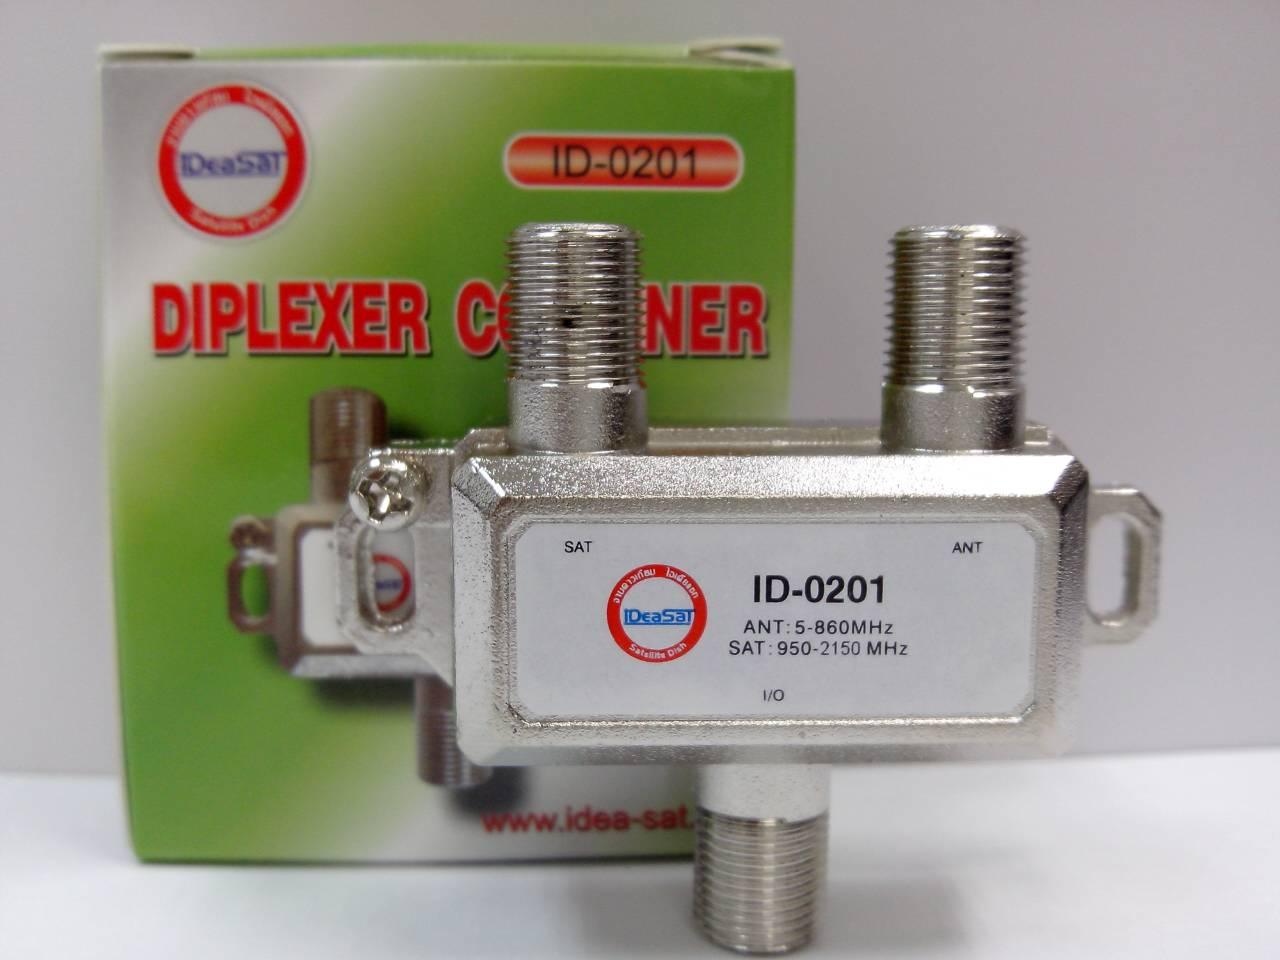 Trộn tín hiệu UHF/VHF-SAT ID-0201